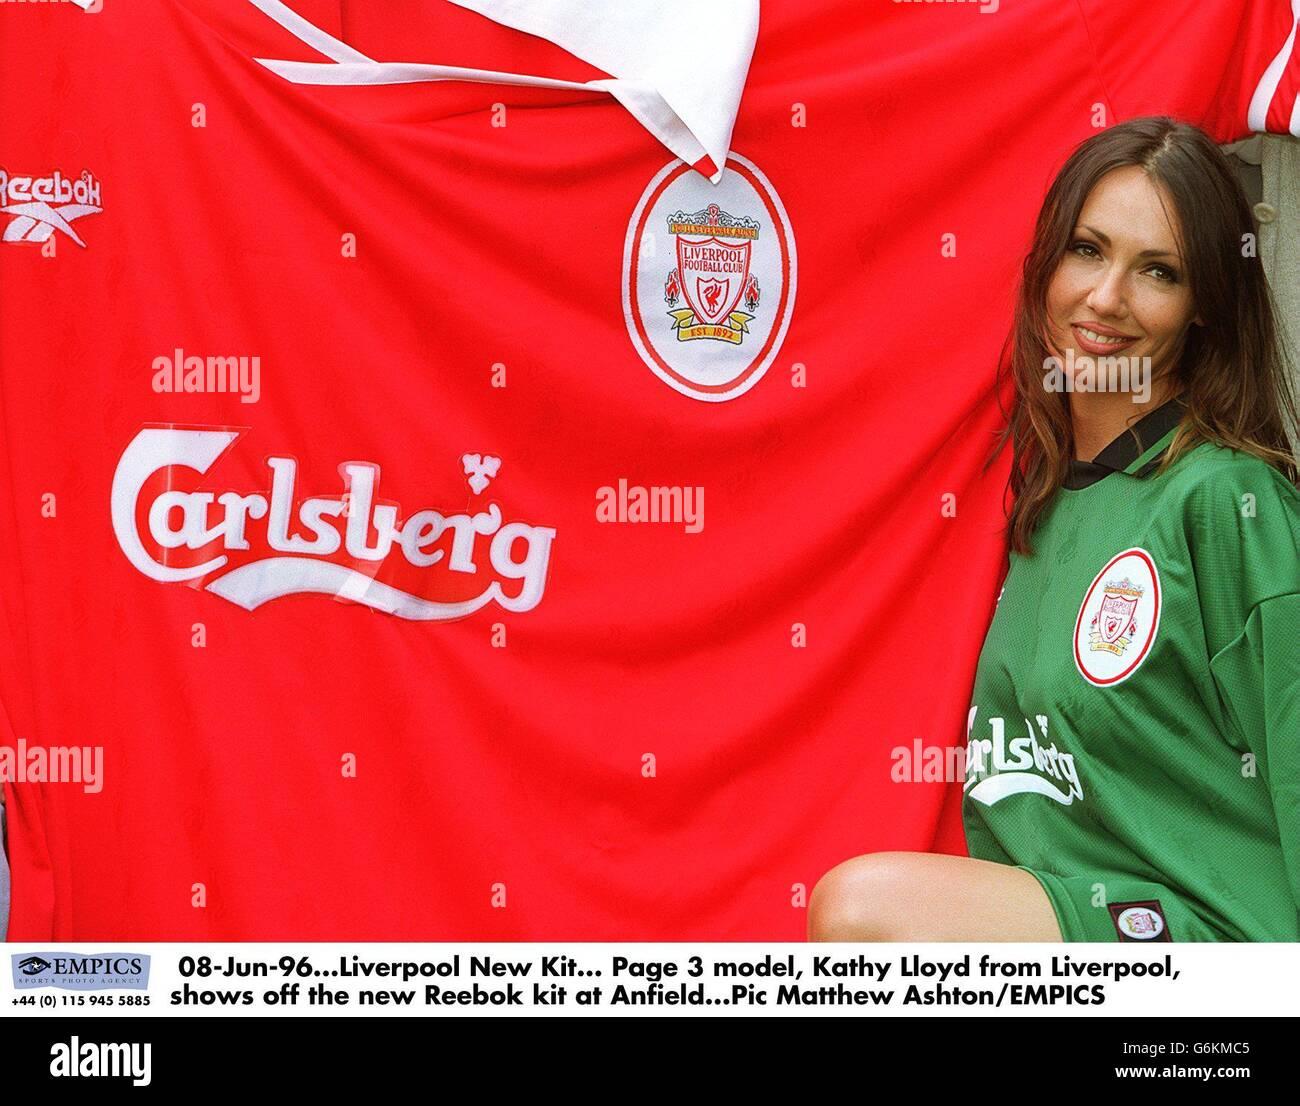 pretty nice 9879d 9c419 Reebok Liverpool New Kit Stock Photos & Reebok Liverpool New ...